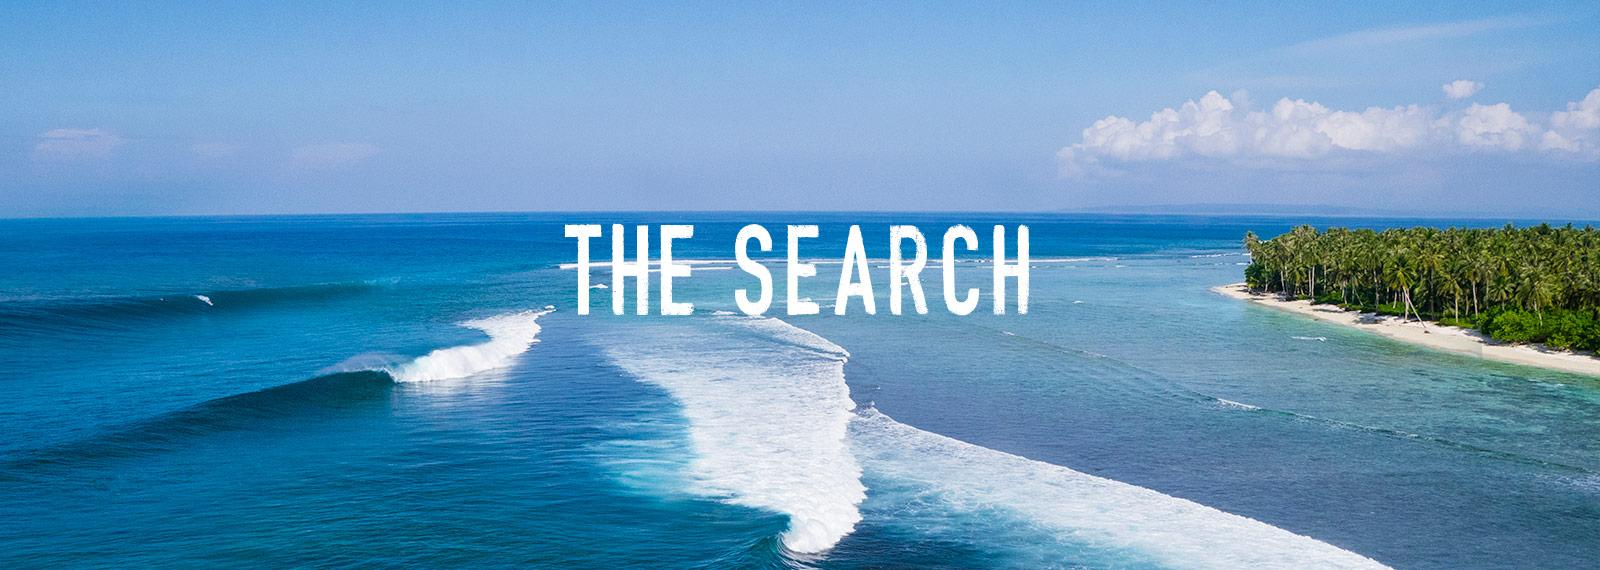 The-Search-1-Carousel-Desktop-7e92fbfd-2247-44ca-ae45-3b260bdbdd84